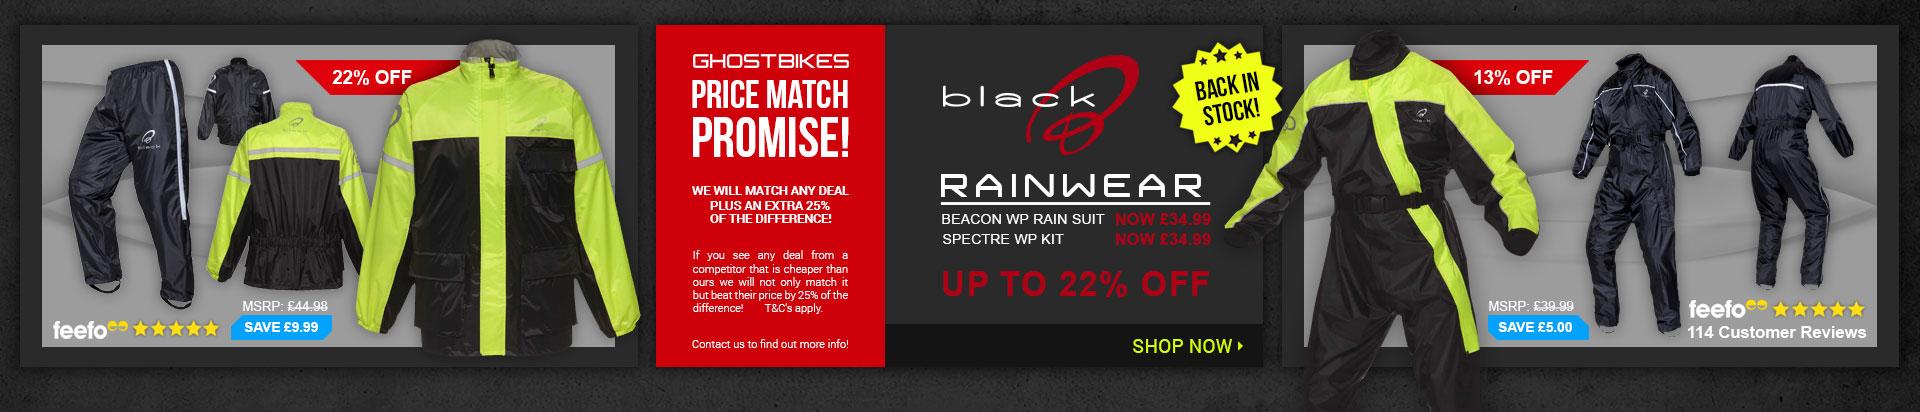 Black Rainwear